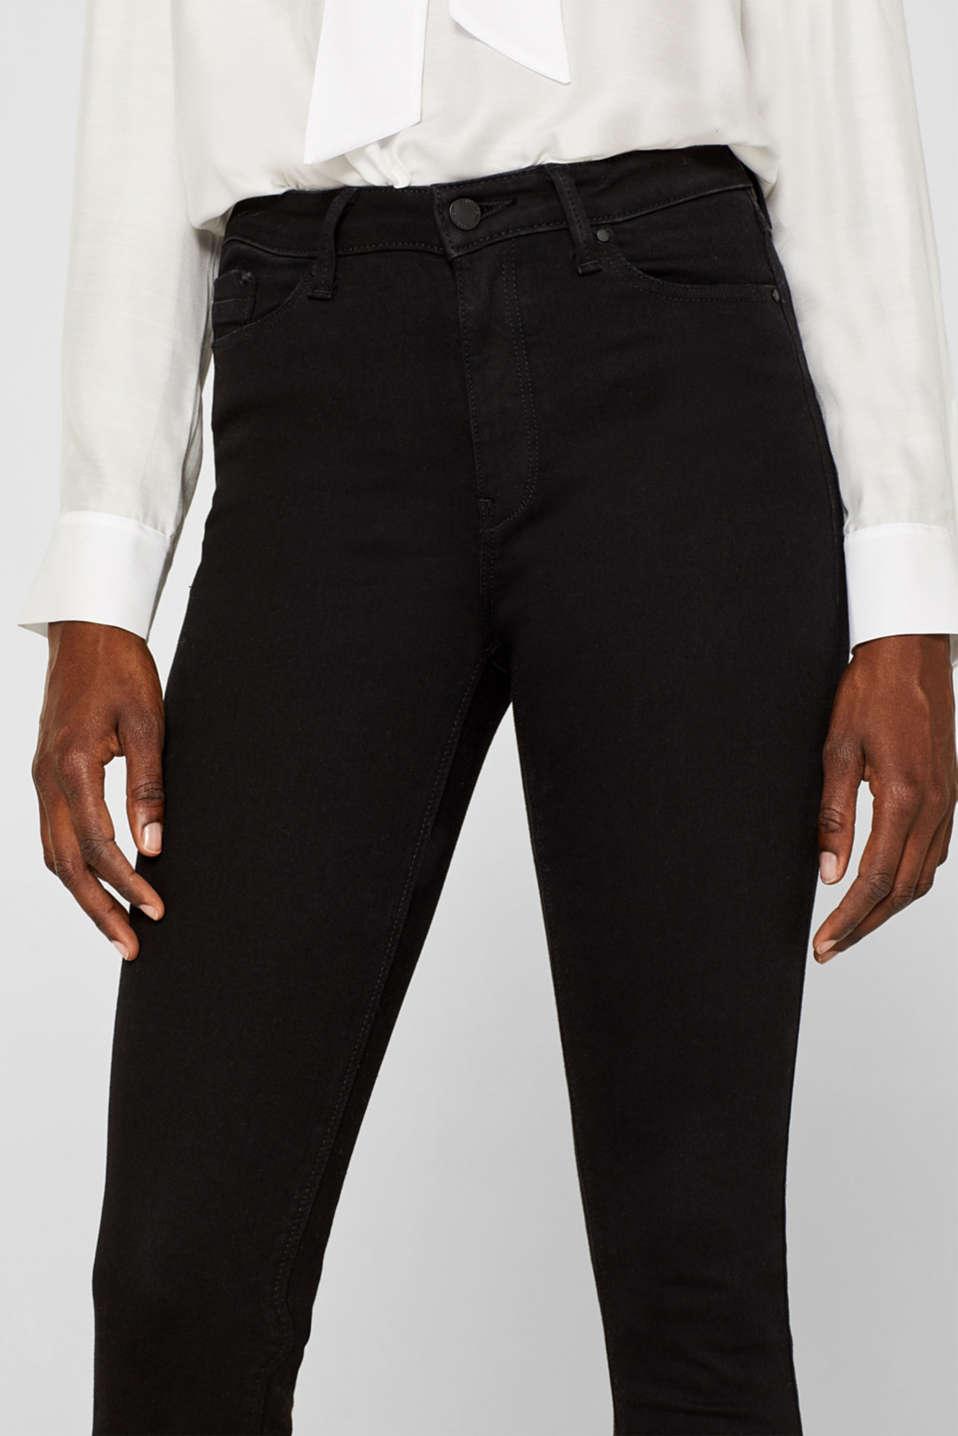 Pants denim, BLACK RINSE, detail image number 1